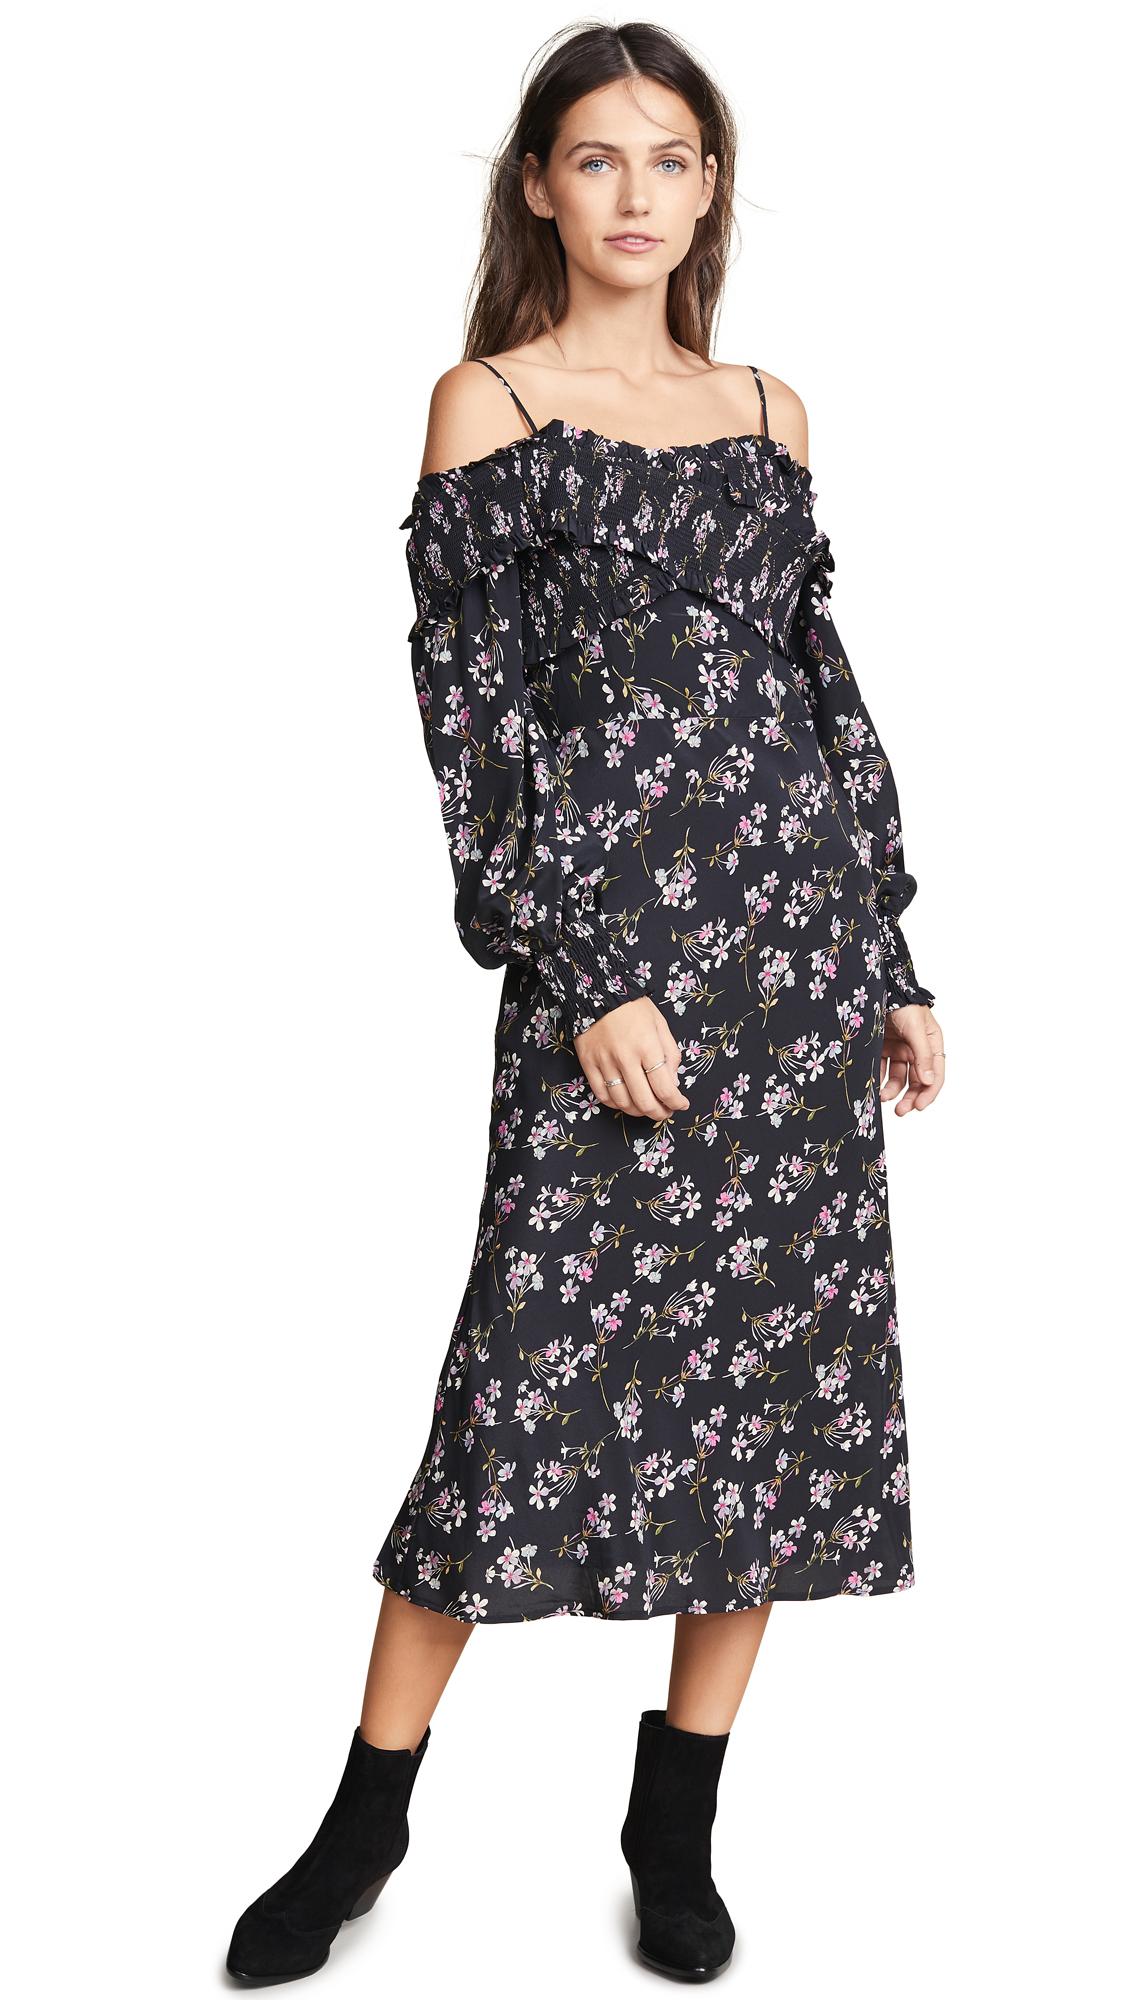 La Maison Talulah Chaleur Midi Dress in Violet Print